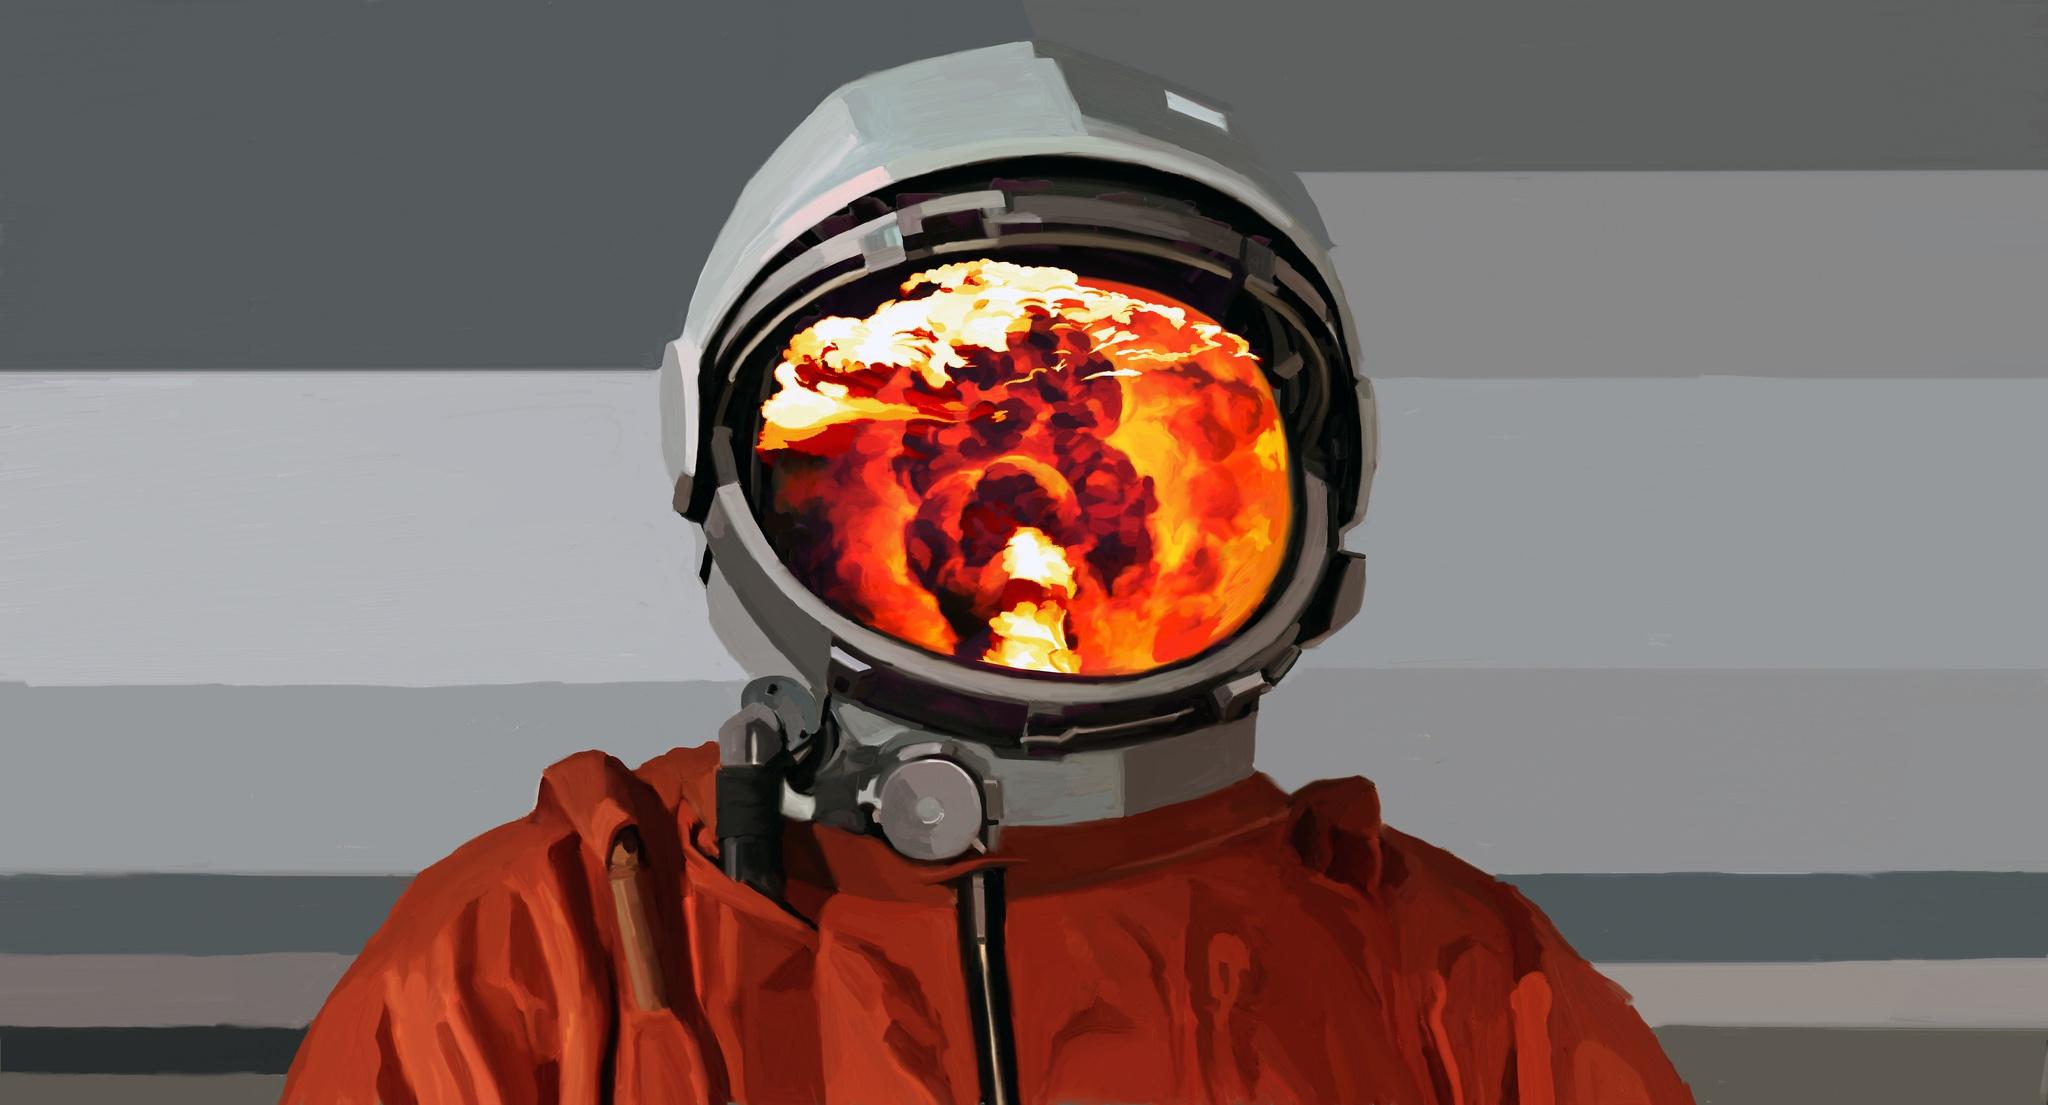 astronaut on fire - HD2048×1105